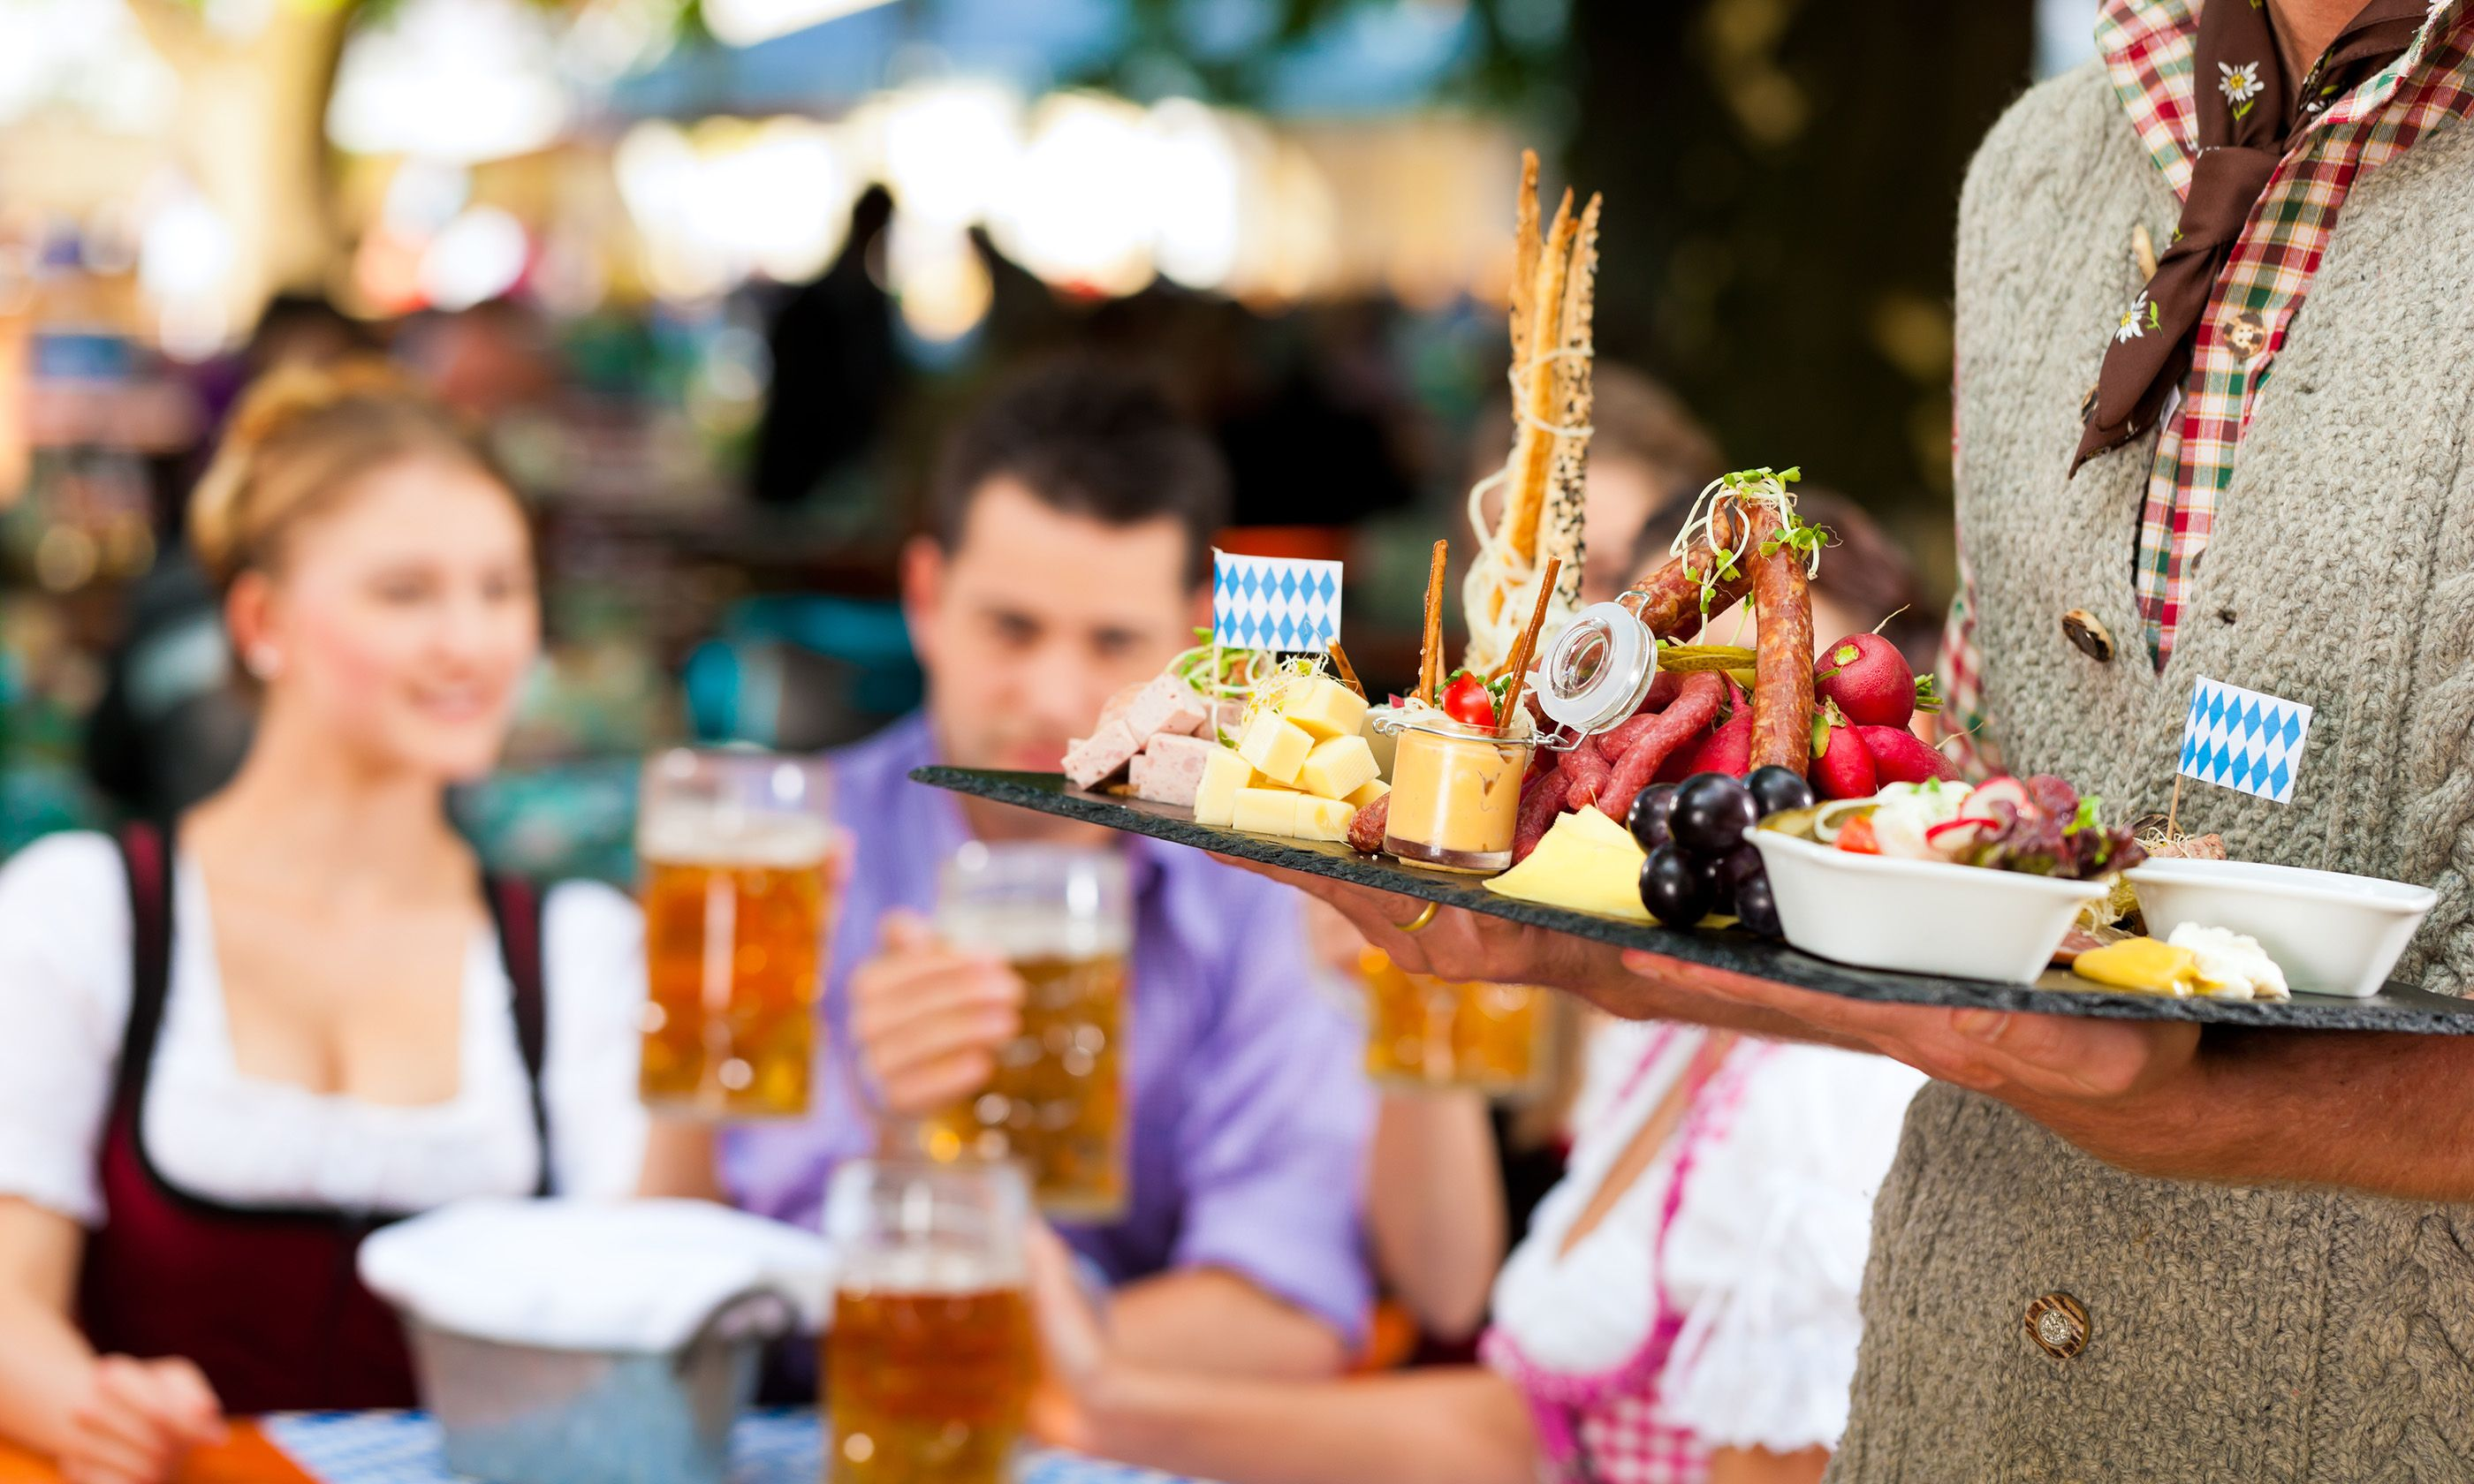 Bavarian beer garden (Shutterstock.com)